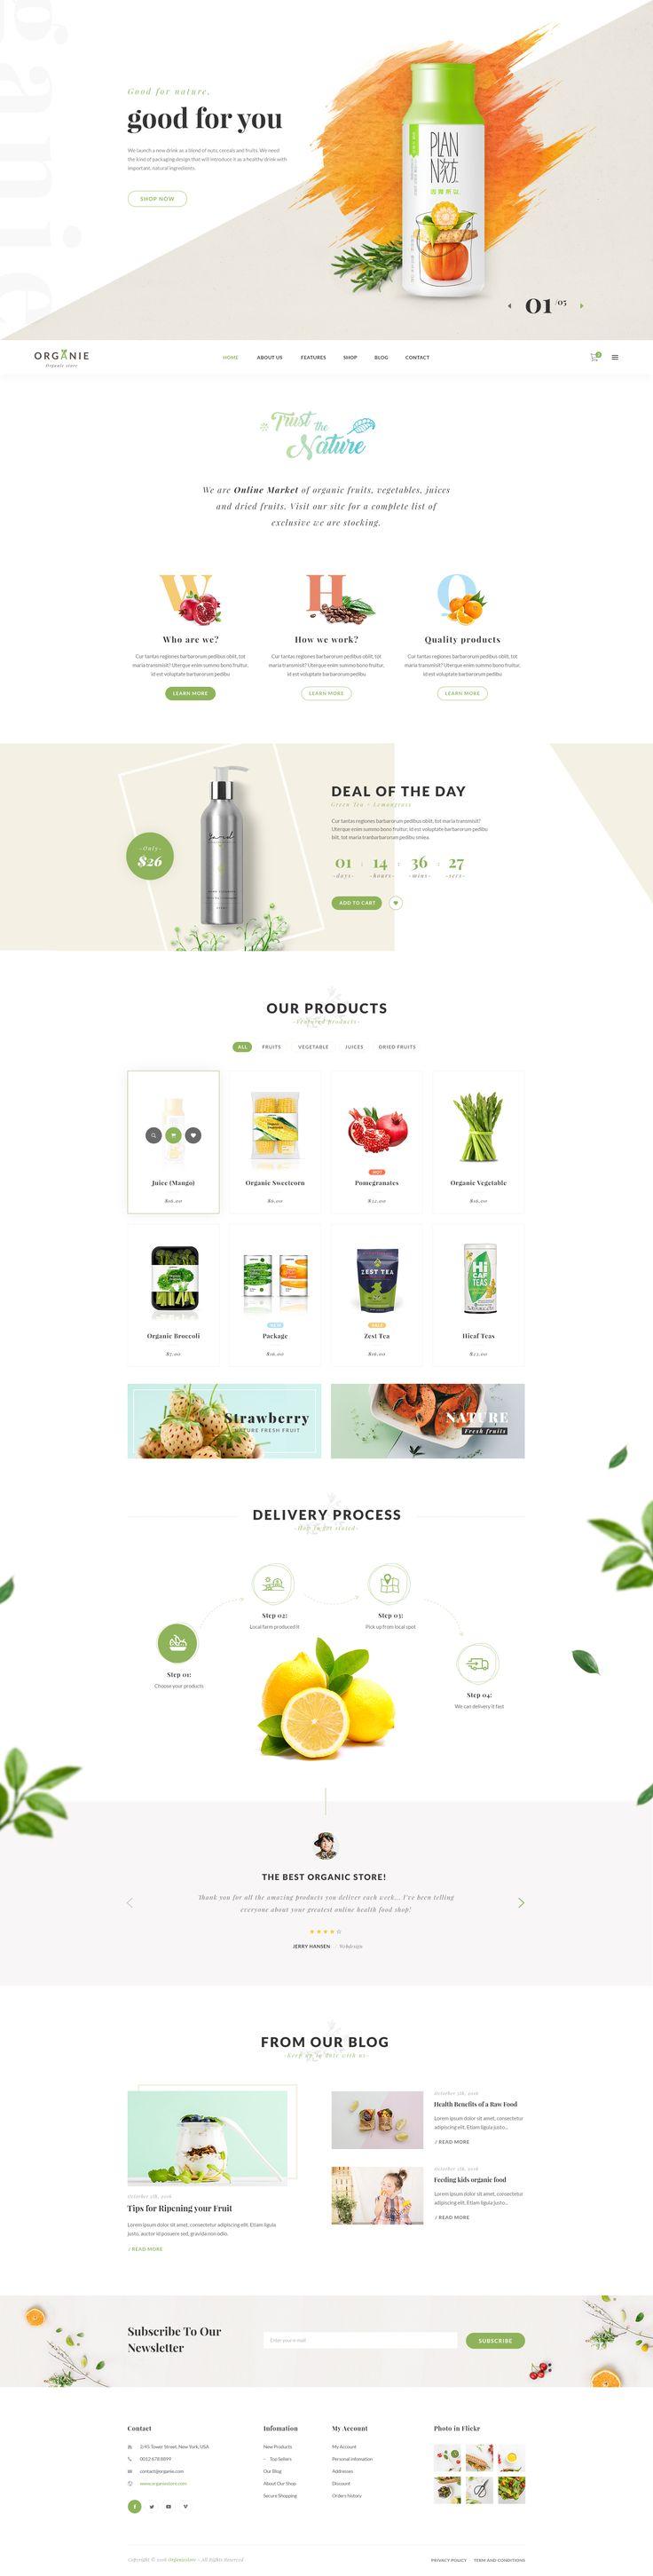 Organie - A Delightful Organic Store PSD Template • Download ➝ https://themeforest.net/item/organie-a-delightful-organic-store-psd-template/18384312?ref=pxcr